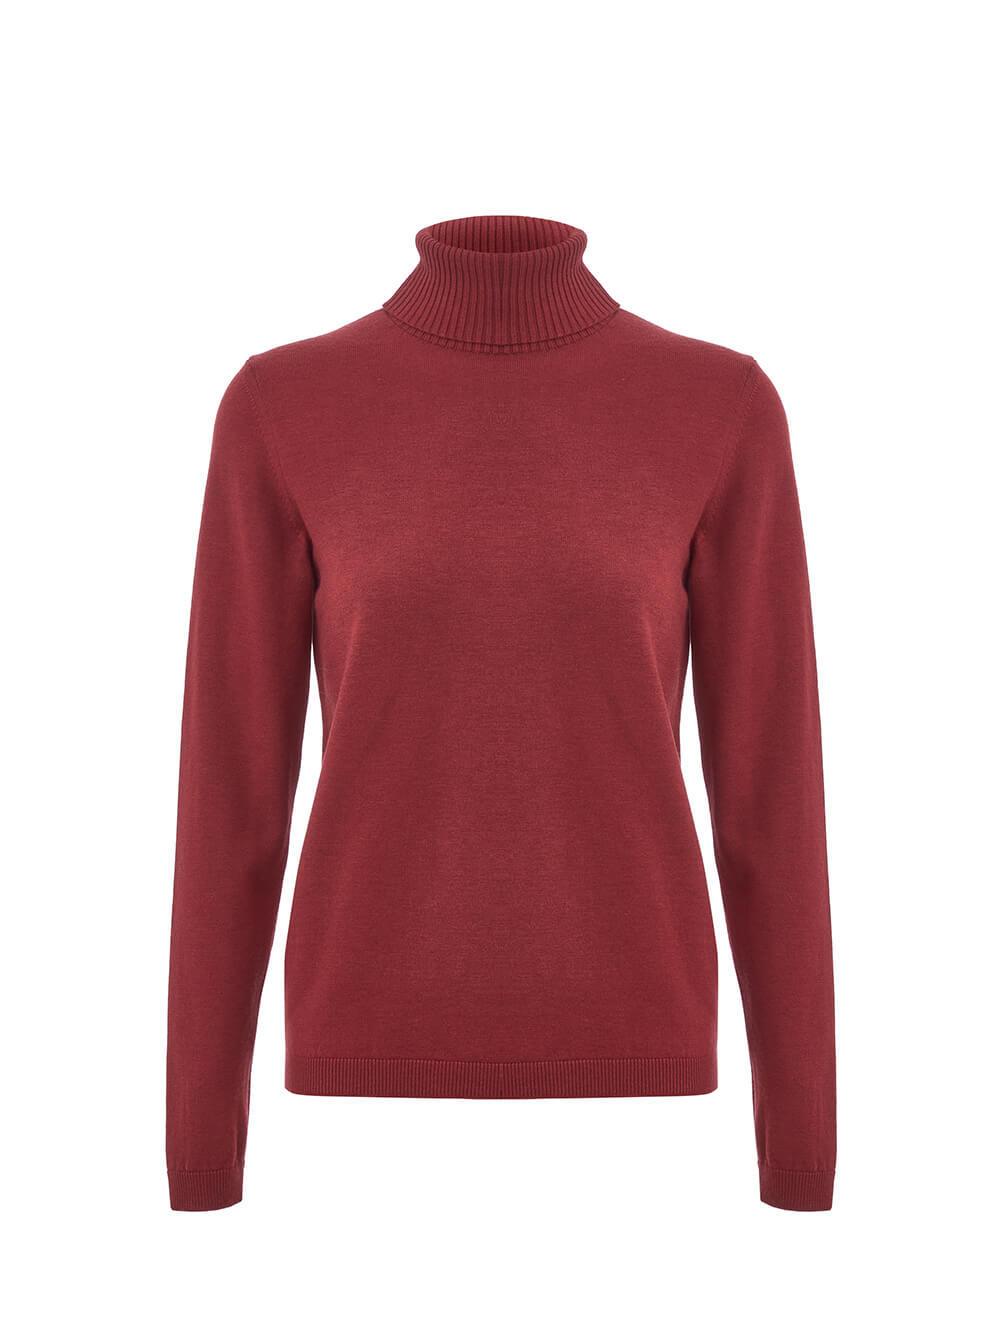 Женский свитер красного цвета из шерсти и шелка - фото 1